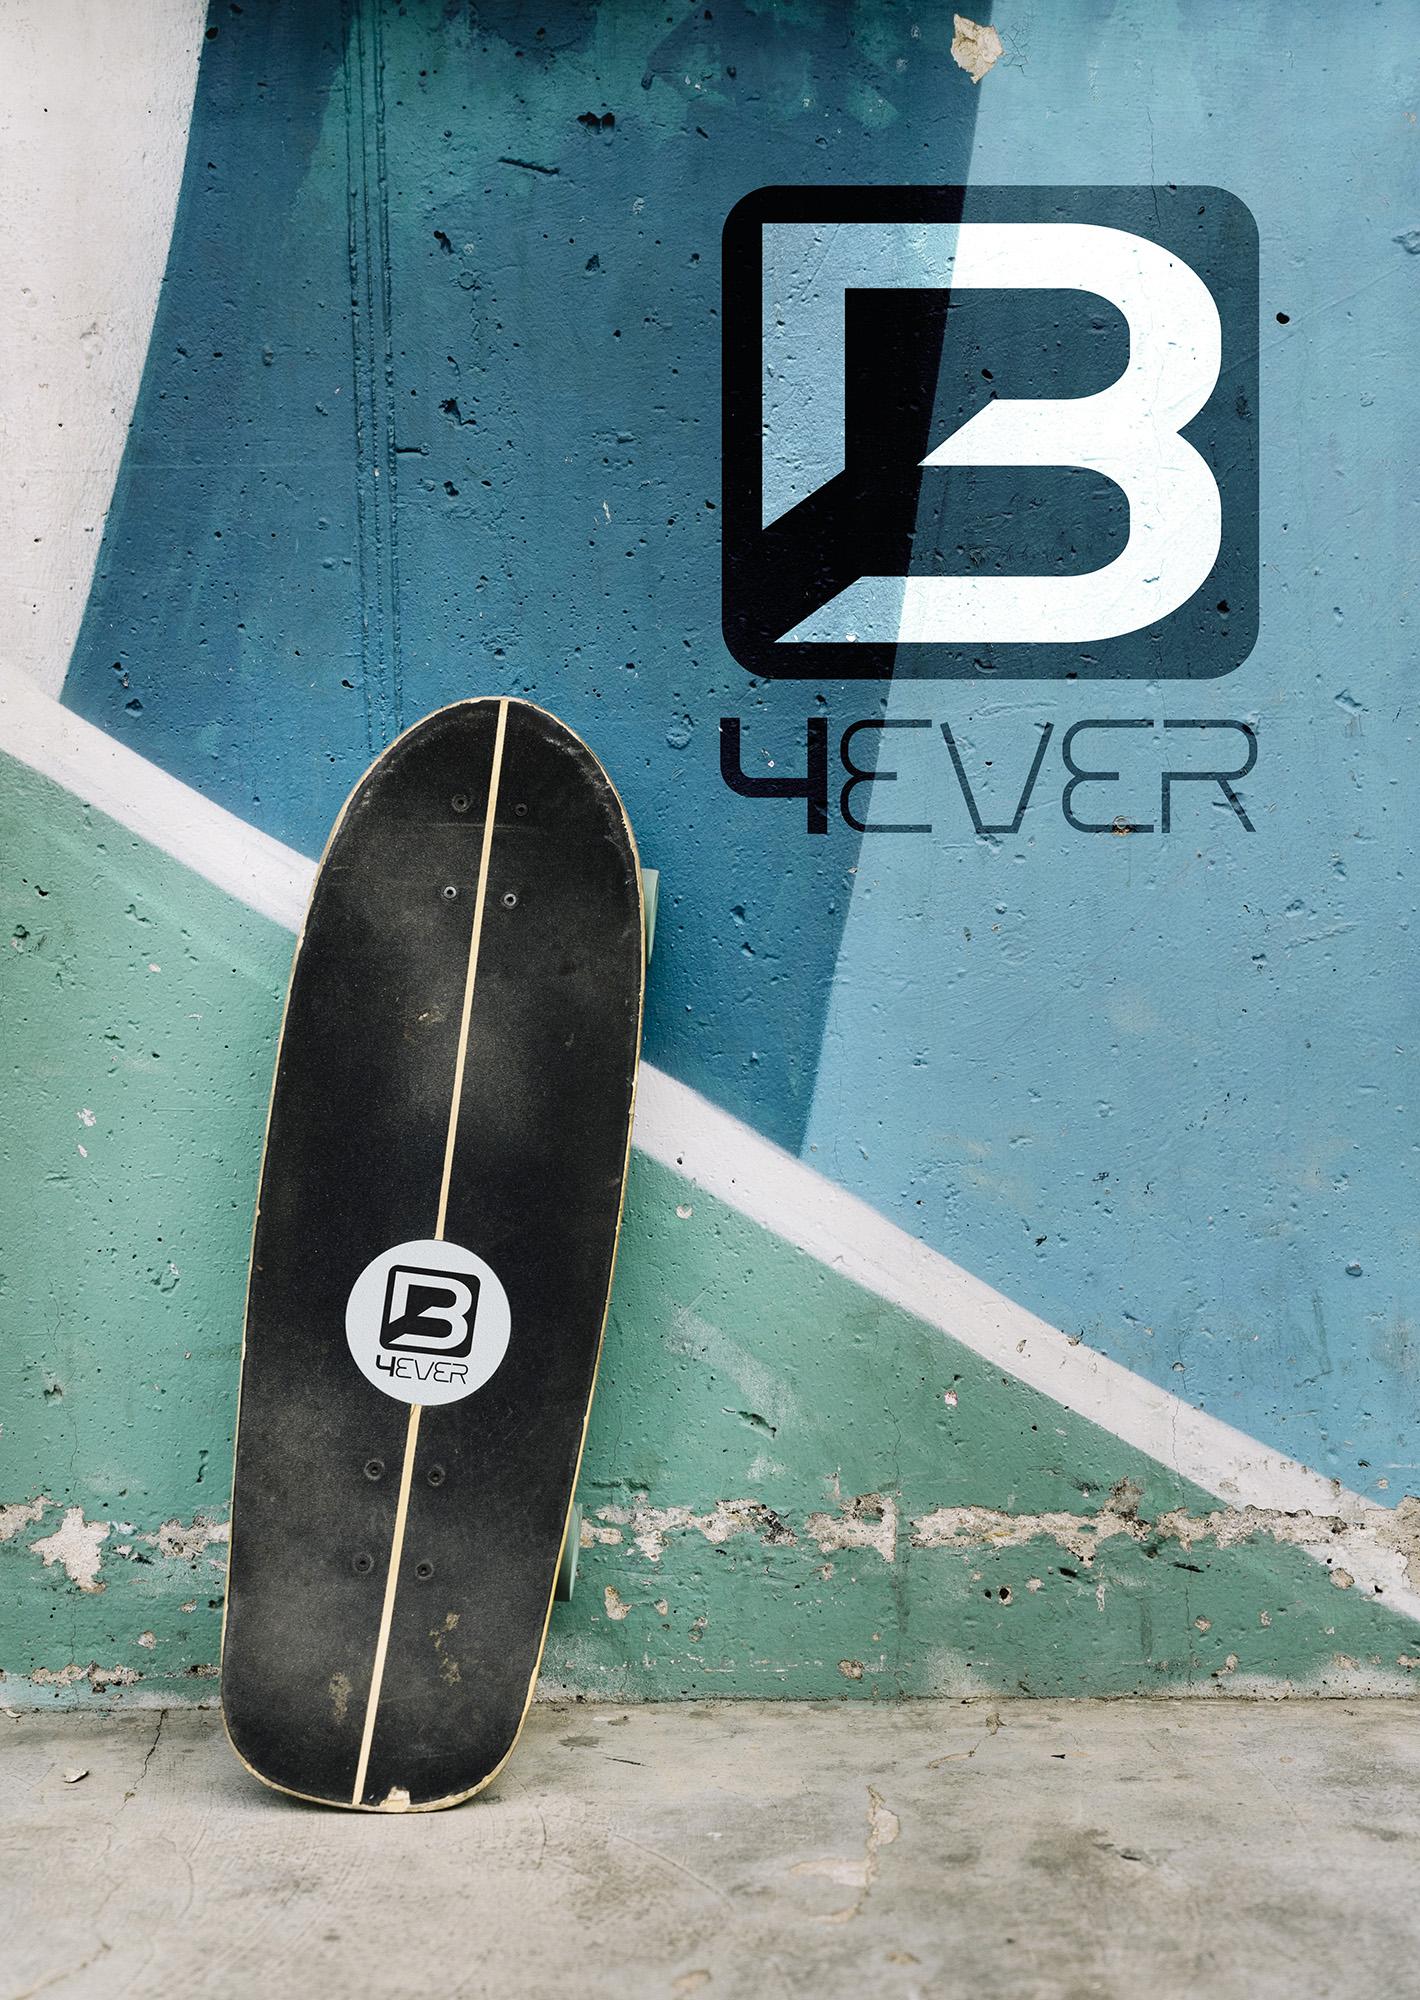 PB 4EVER